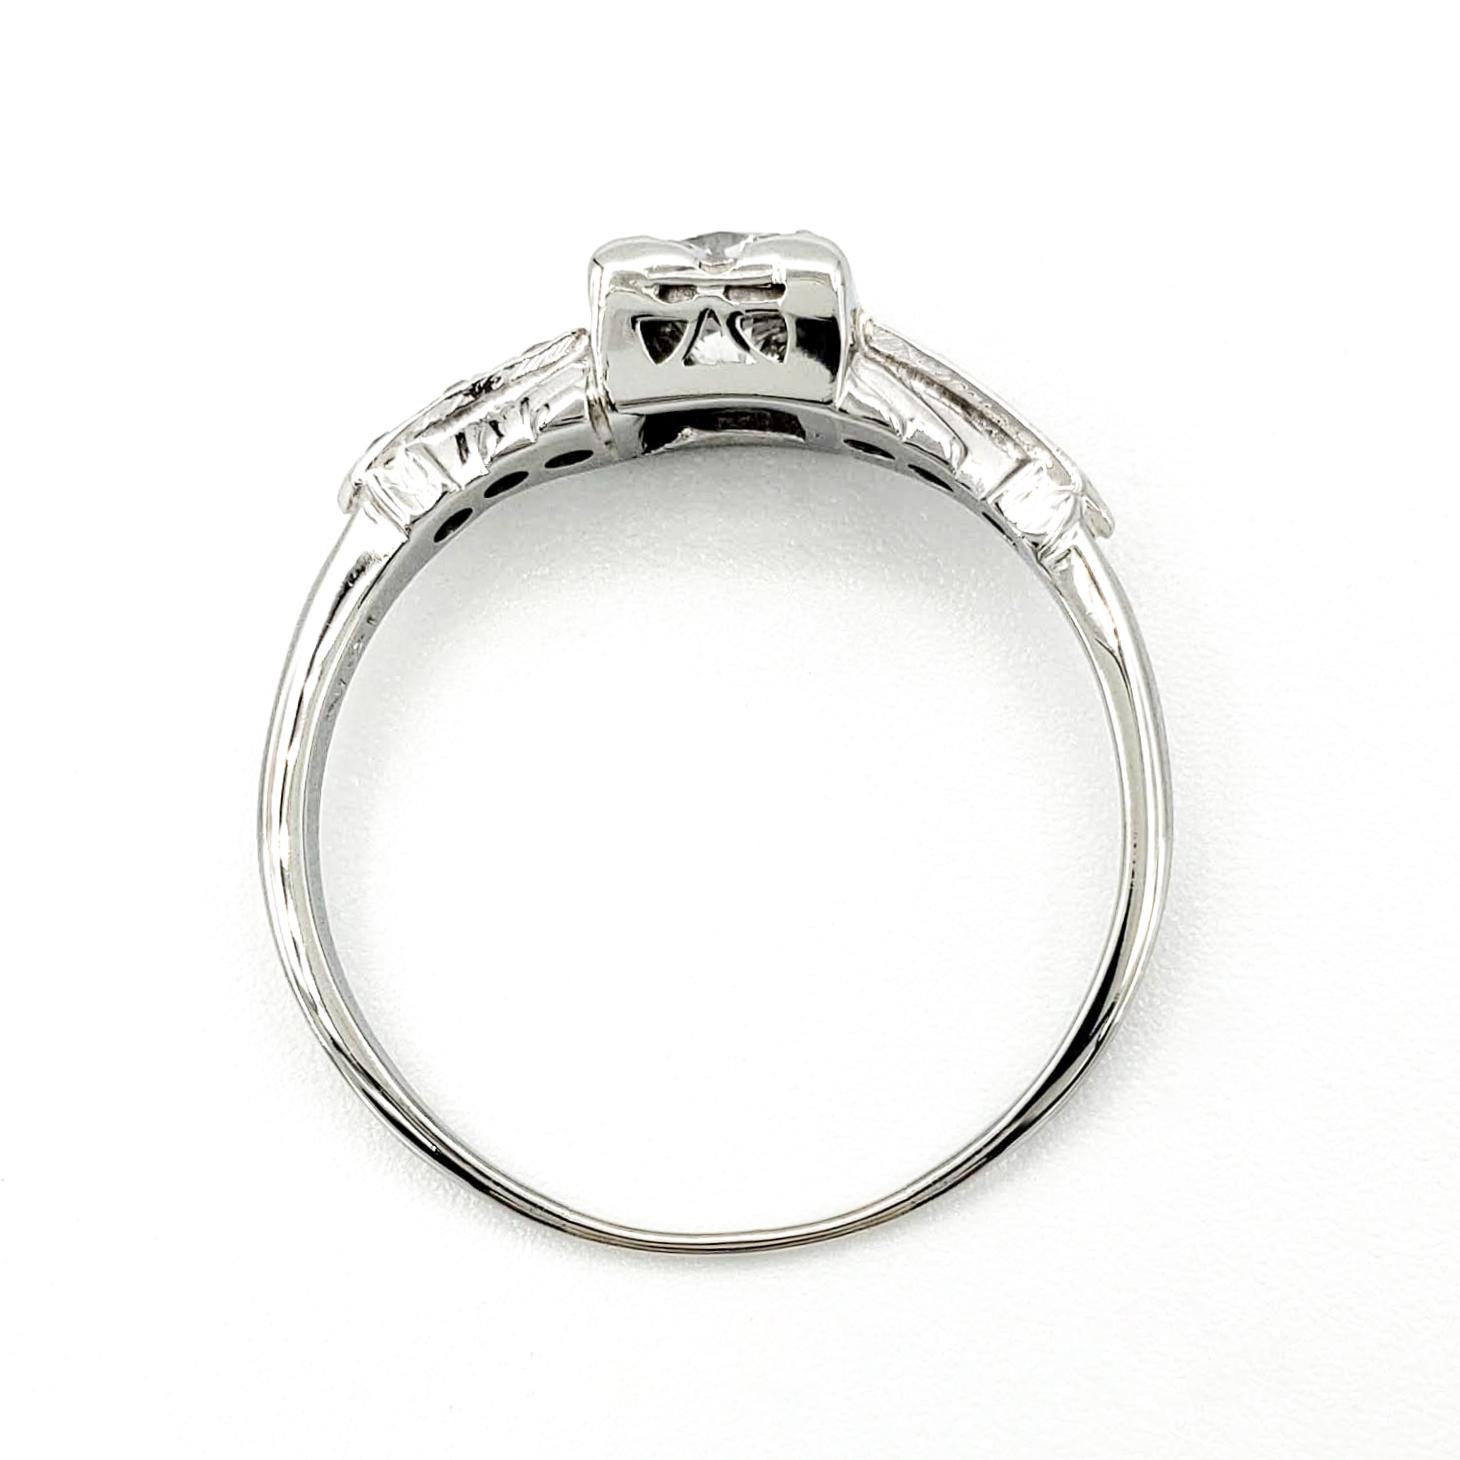 vintage-platinum-engagement-ring-with-0-72-carat-old-european-cut-diamond-gia-e-si1